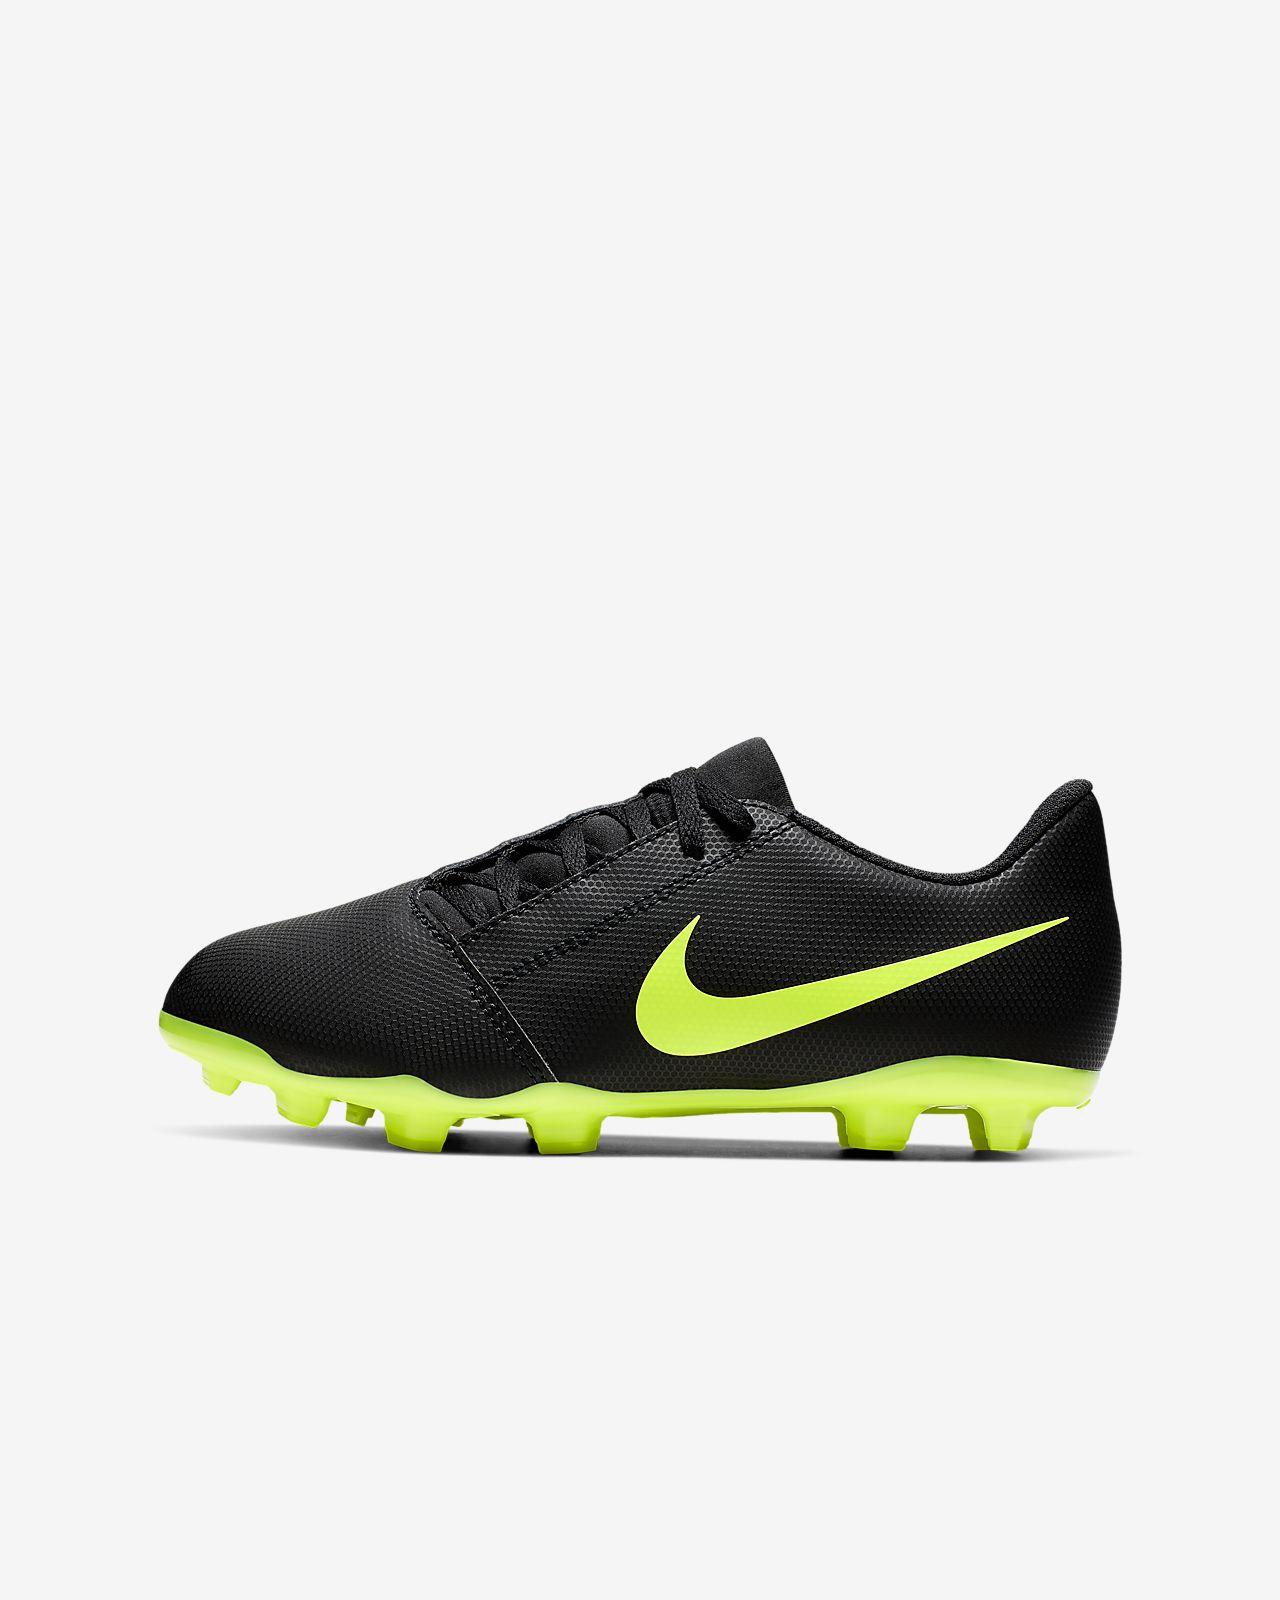 Sec Fg Enfant Club JrPhantom Terrain Football À De Nike Crampons Chaussure Venom Pour SUqVzMp